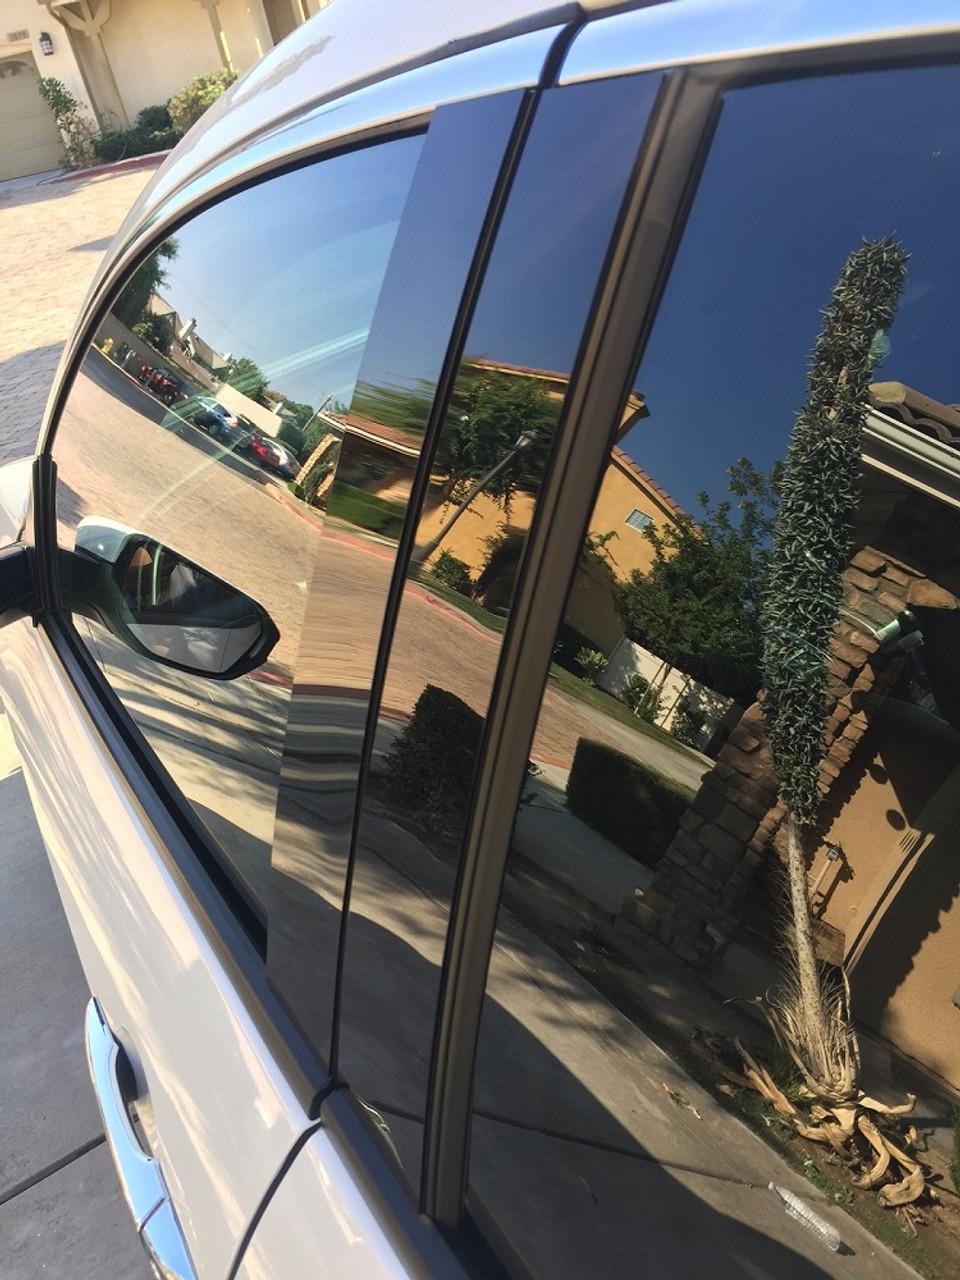 Volkswagen Passat 2012 2019 Glossy Black Pillar Posts Trim 6pcs 707 Motoring Auto Parts Accessories